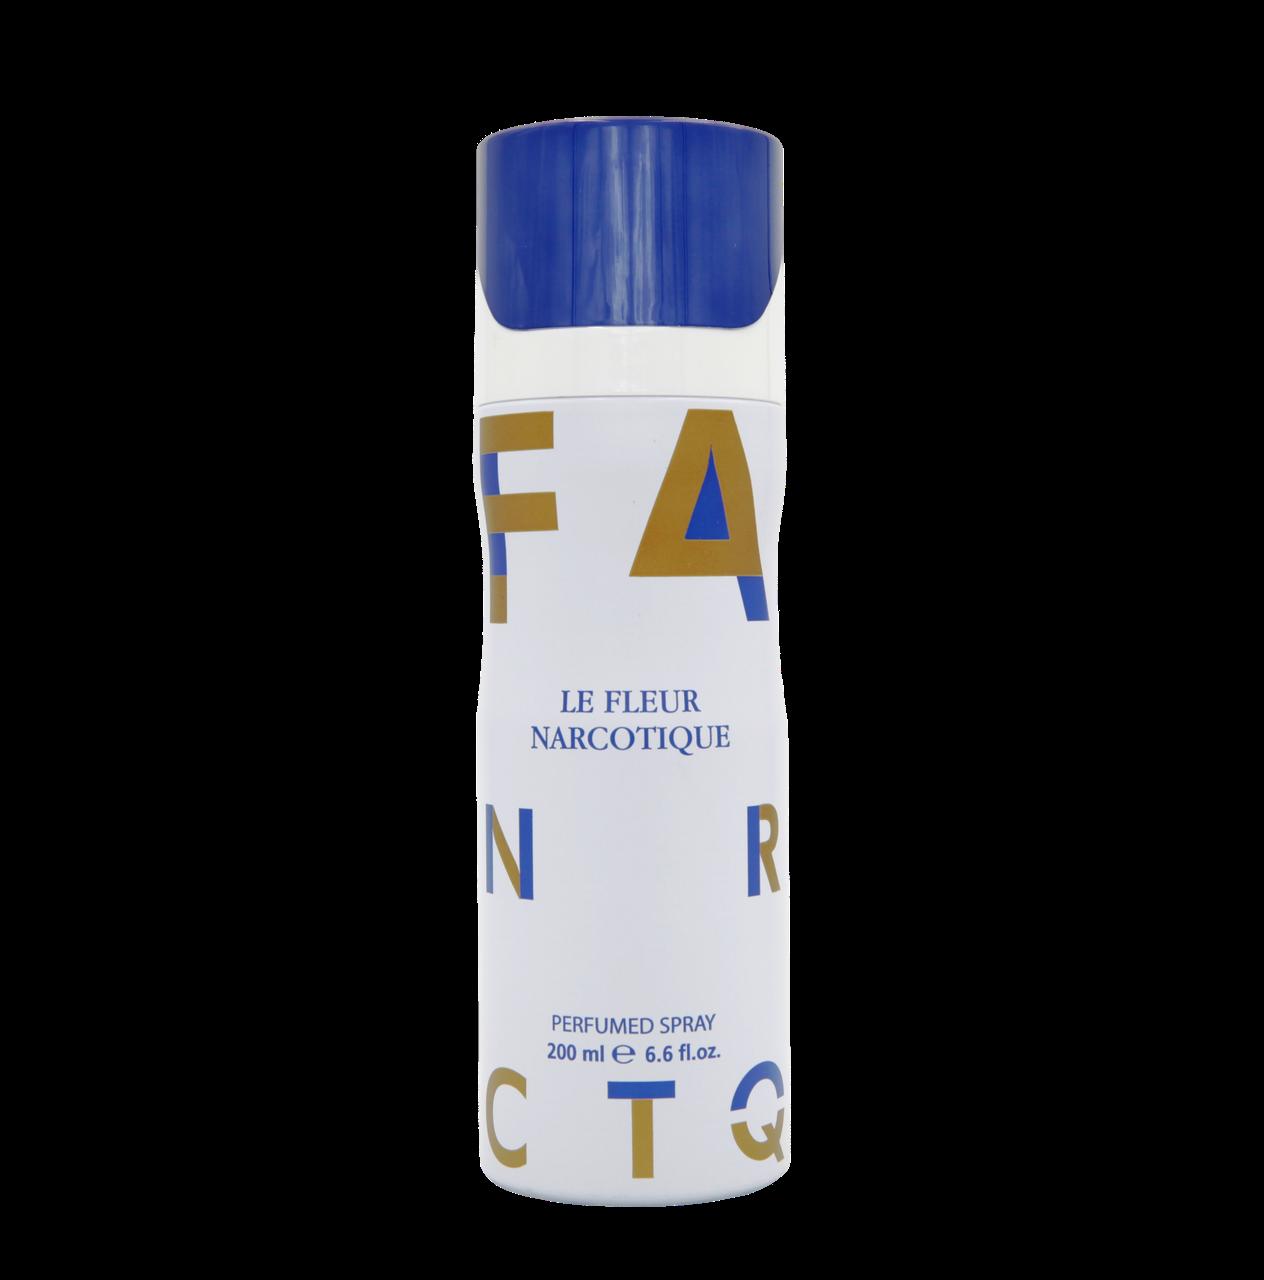 Le Fleur Narcotique дезодорант Fragrance World